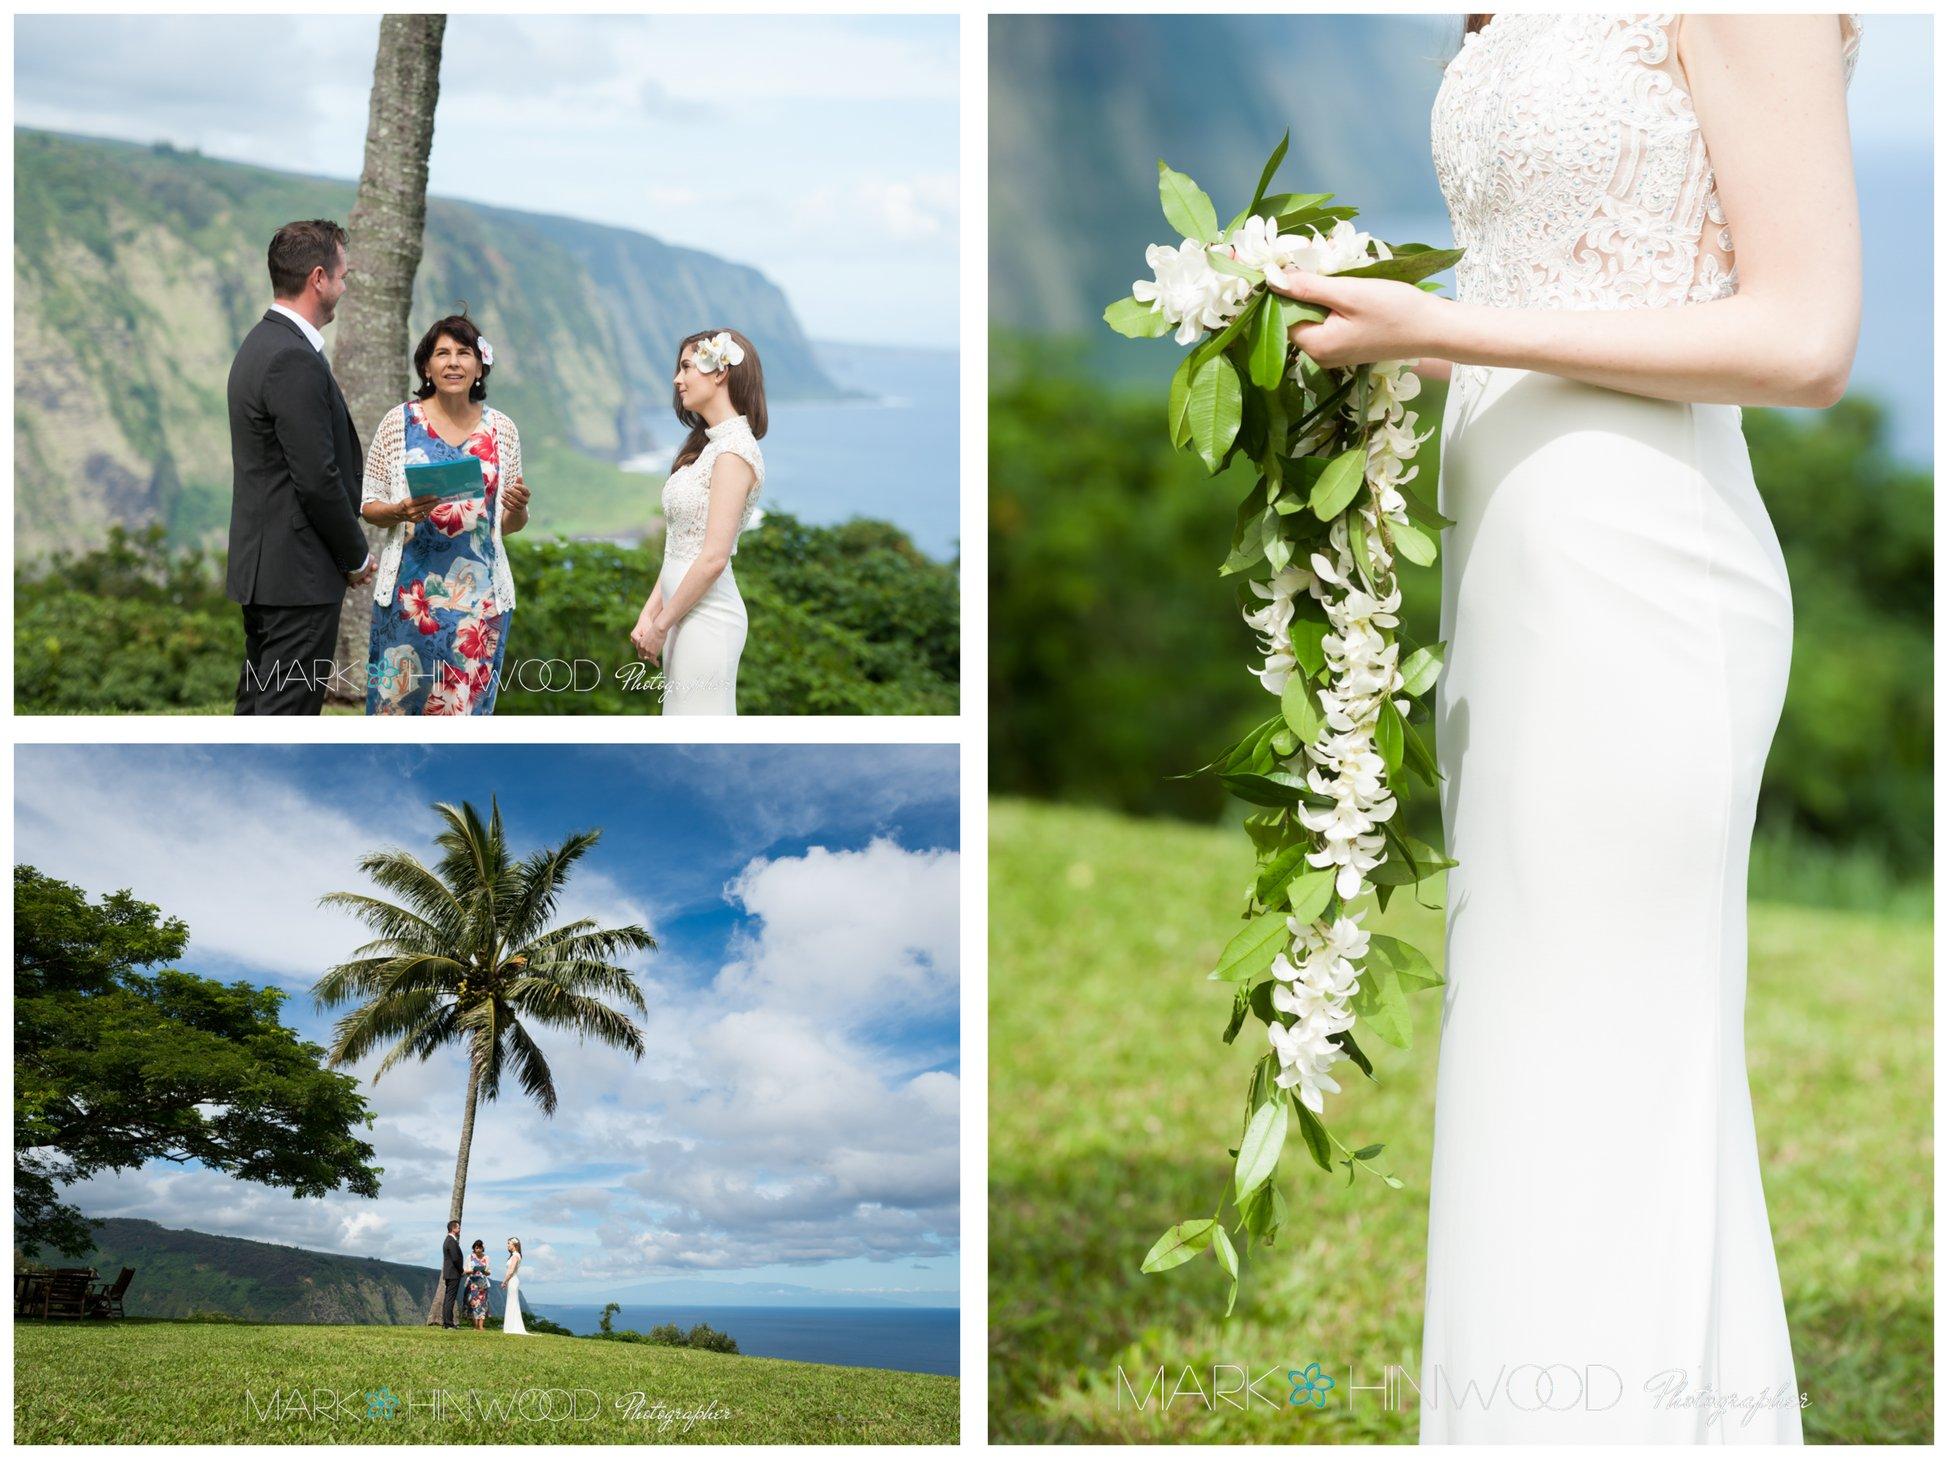 Best Kailua Kona Photographer 5-2